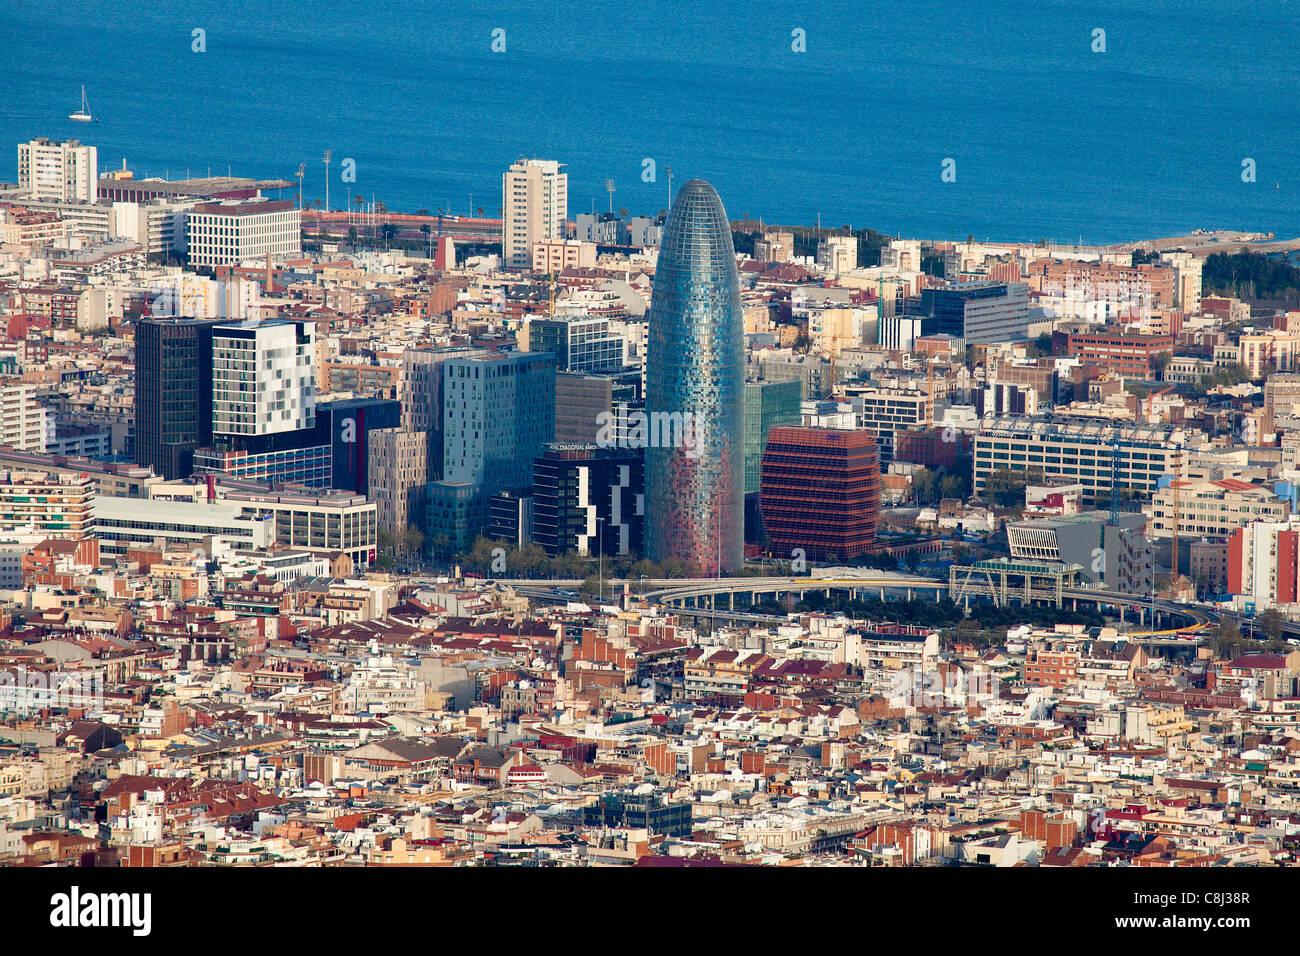 Spain, Europe, Barcelona, Glorias, Akbar Tower, architecture - Stock Image